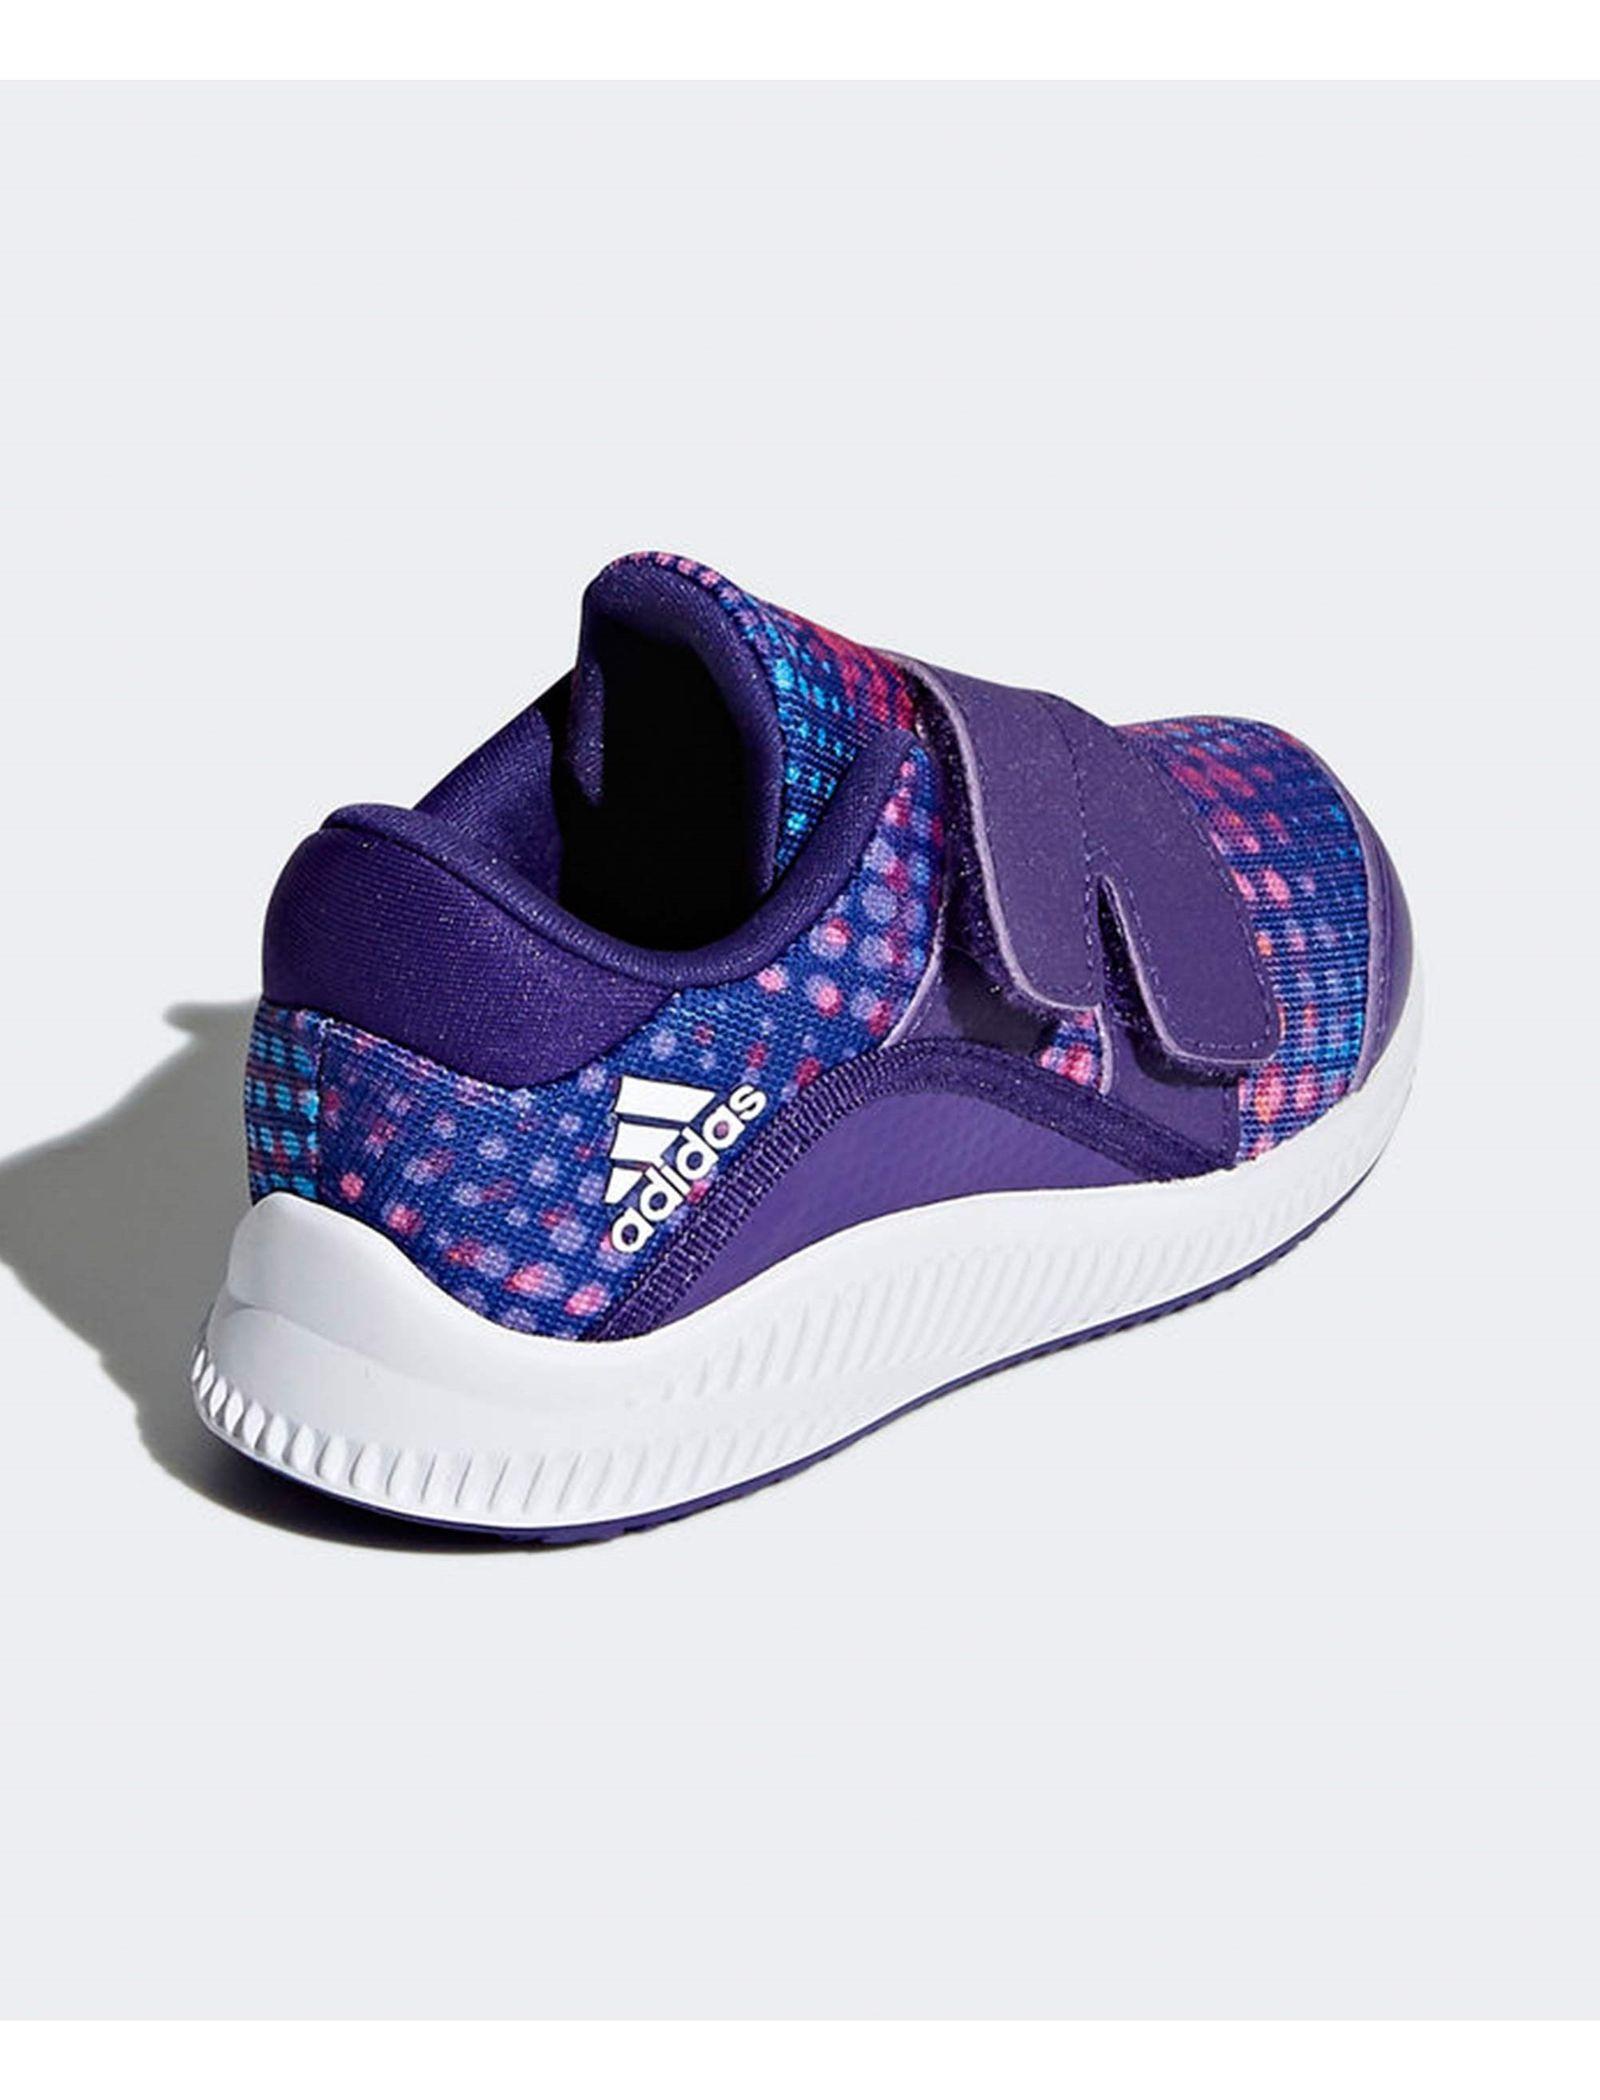 کفش دویدن بندی بچه گانه Fortarun X - آدیداس -  - 5